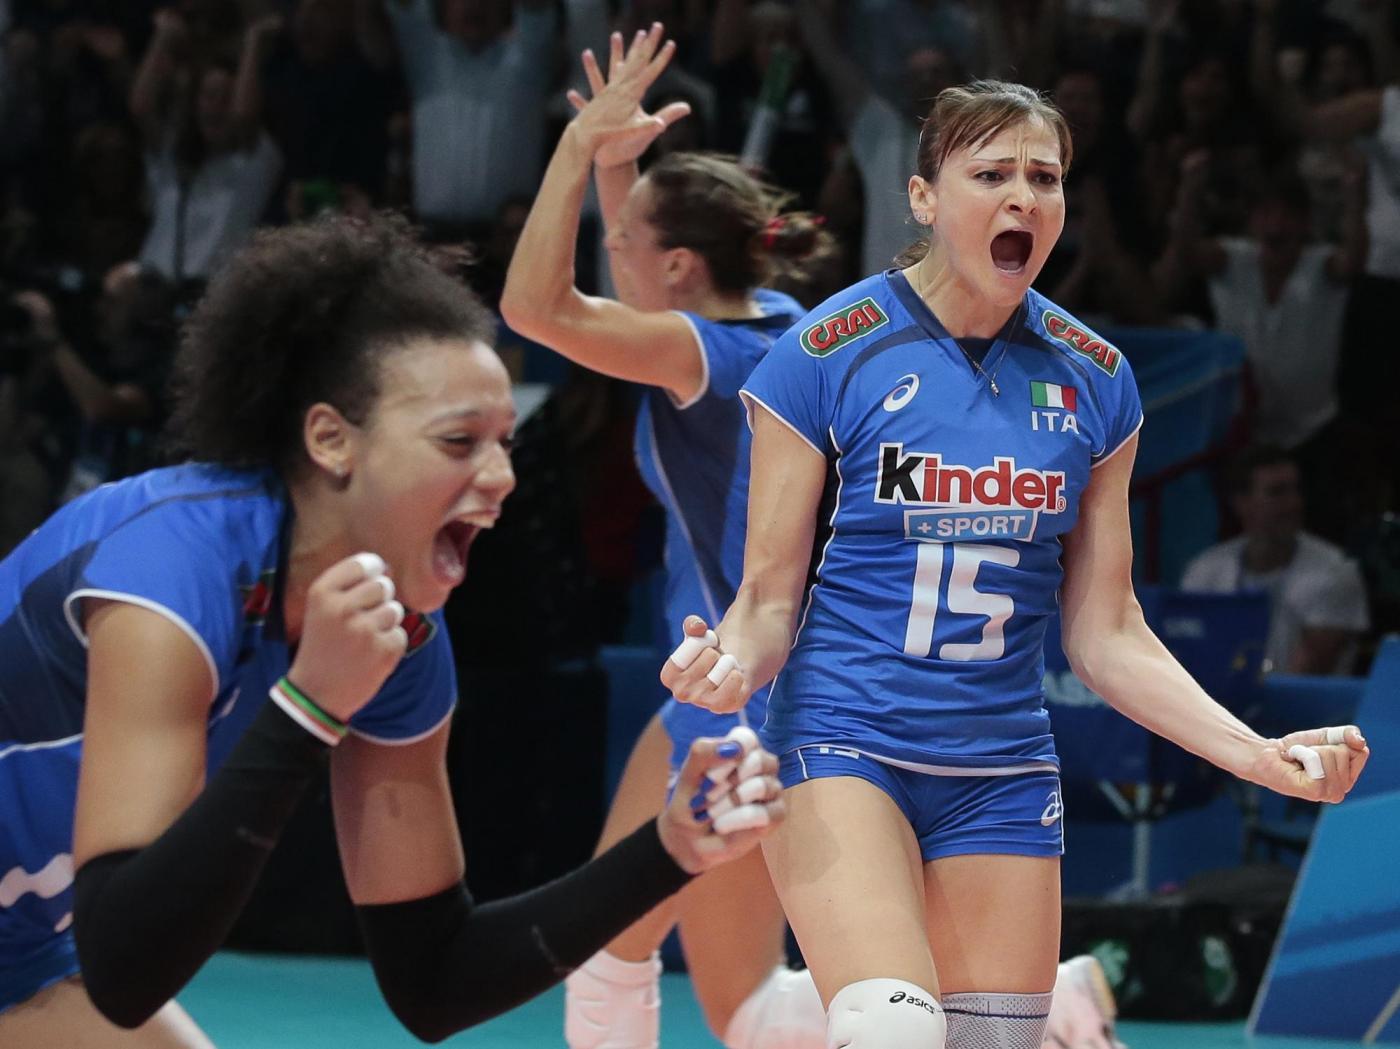 Mondiali Volley: Italia quarta, vincono gli USA